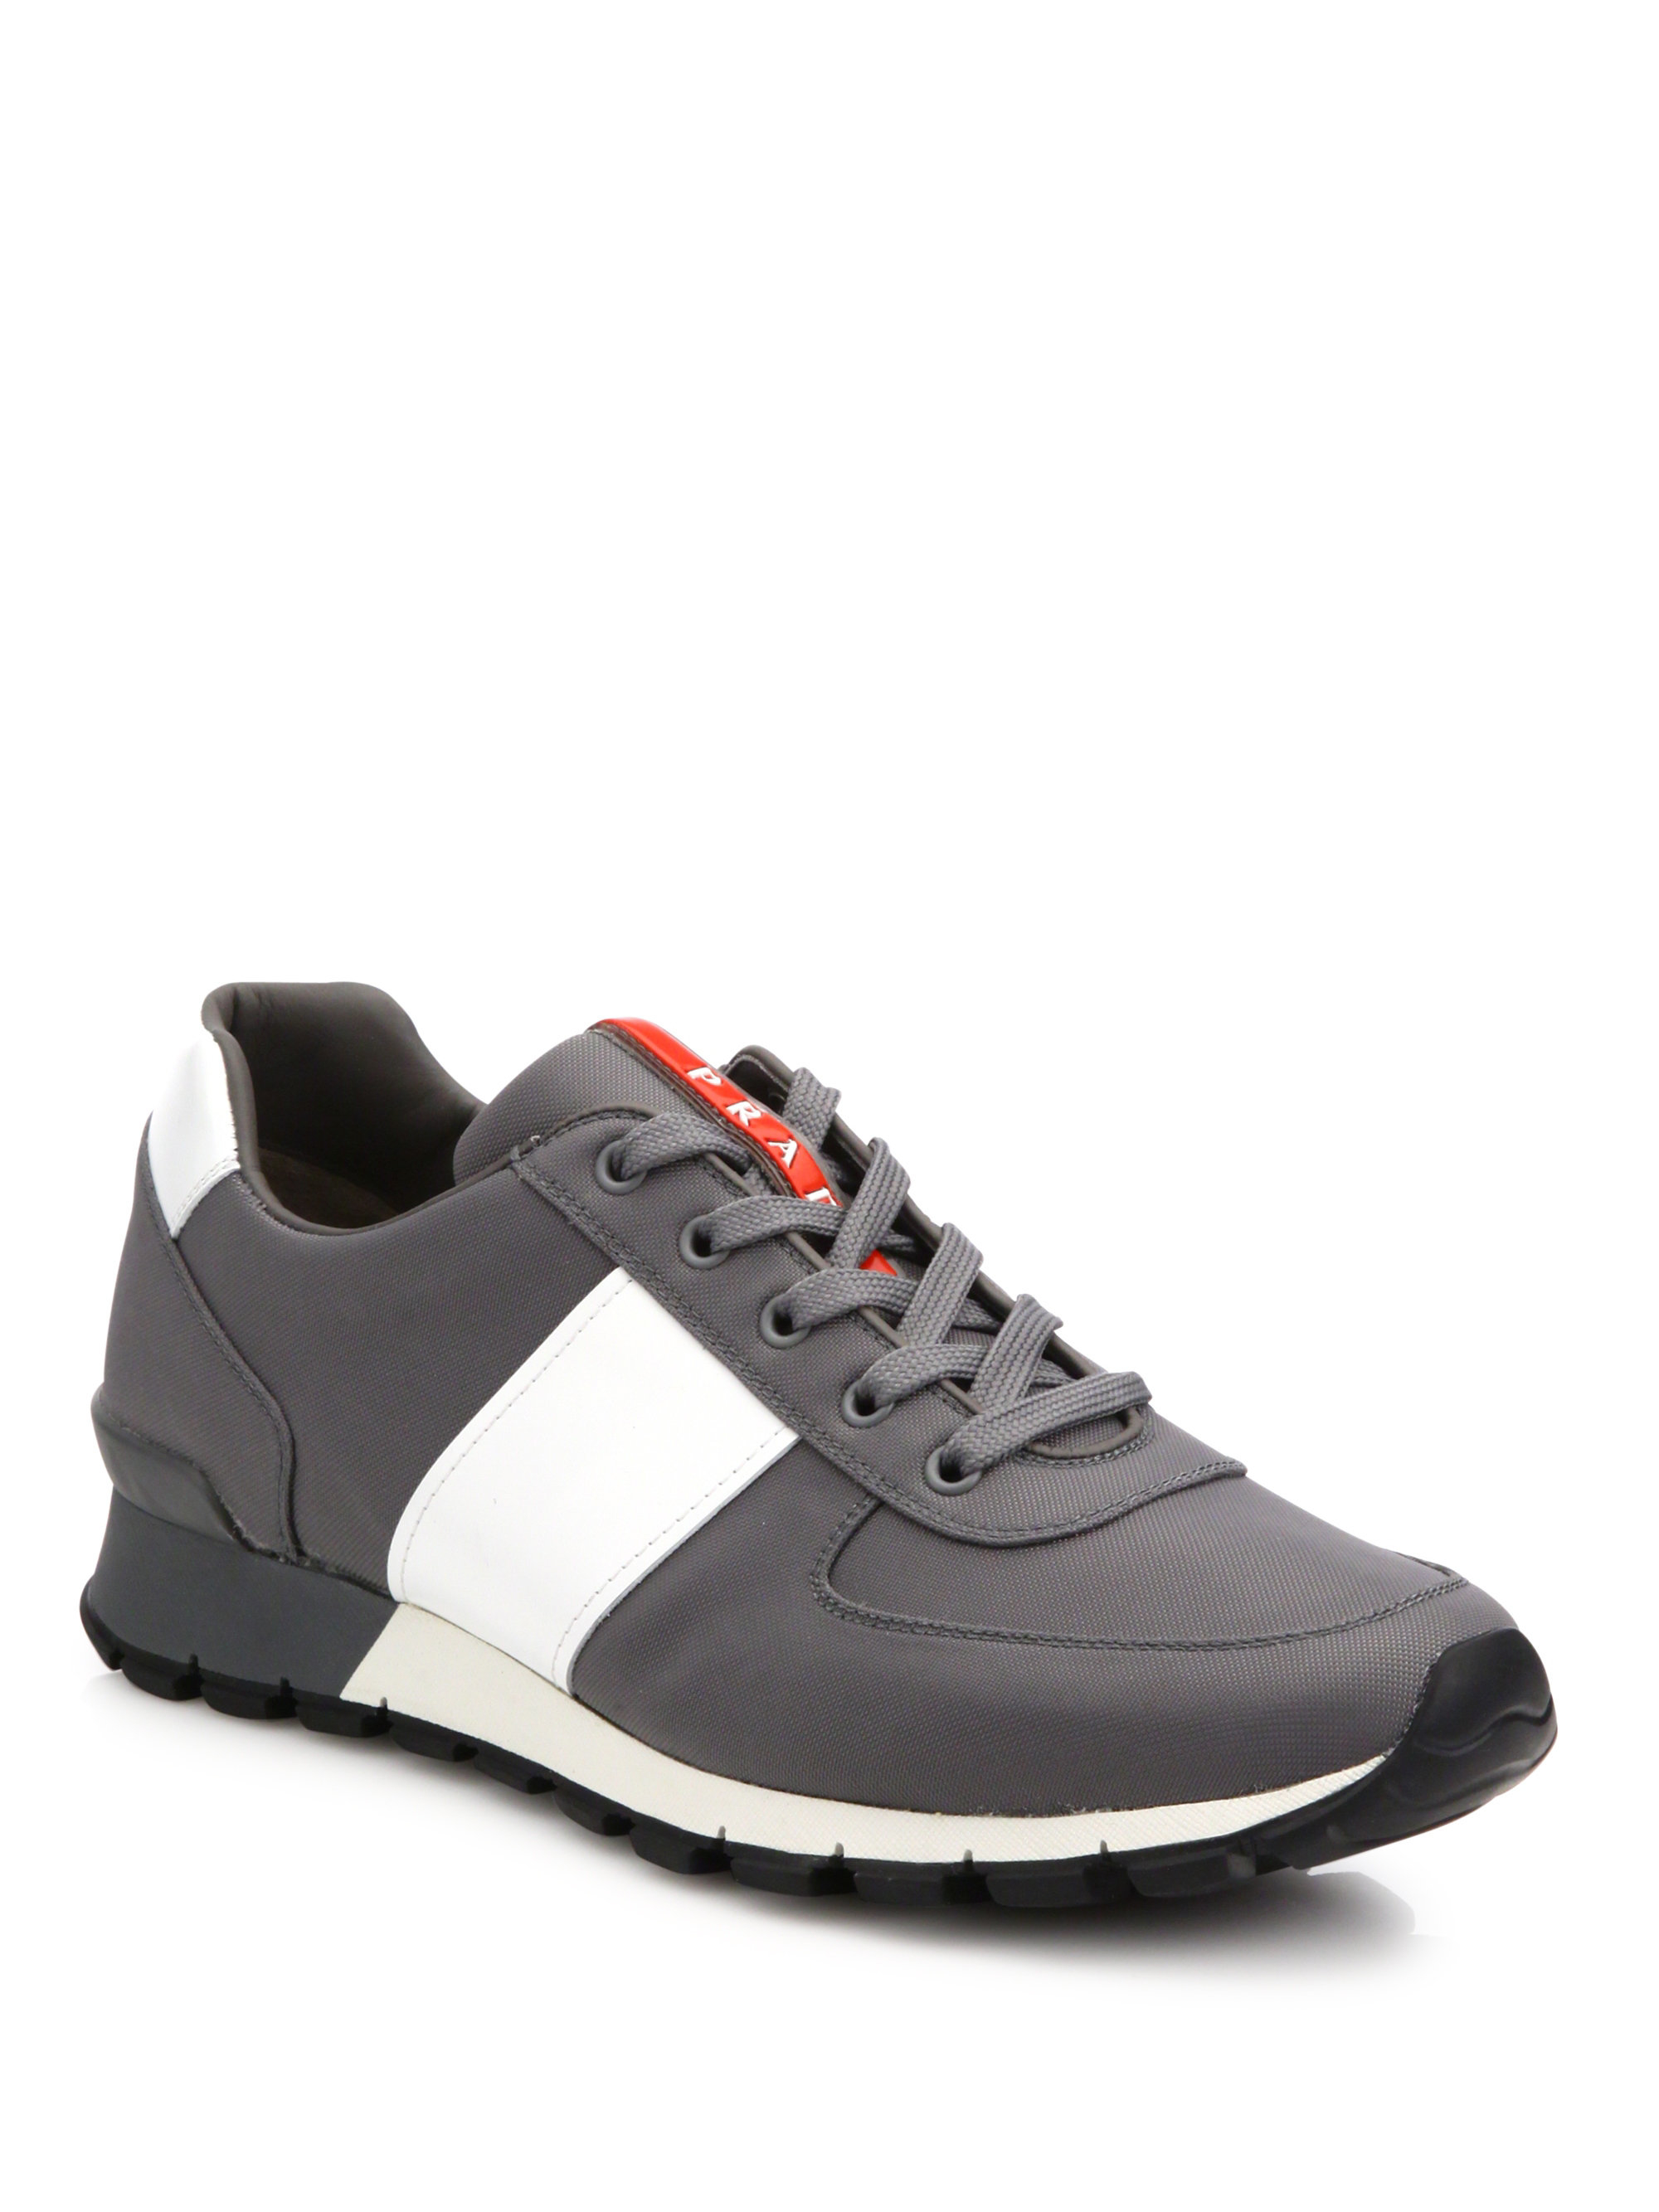 Prada Spazzolato Trainer Sneakers in Gray for Men | Lyst